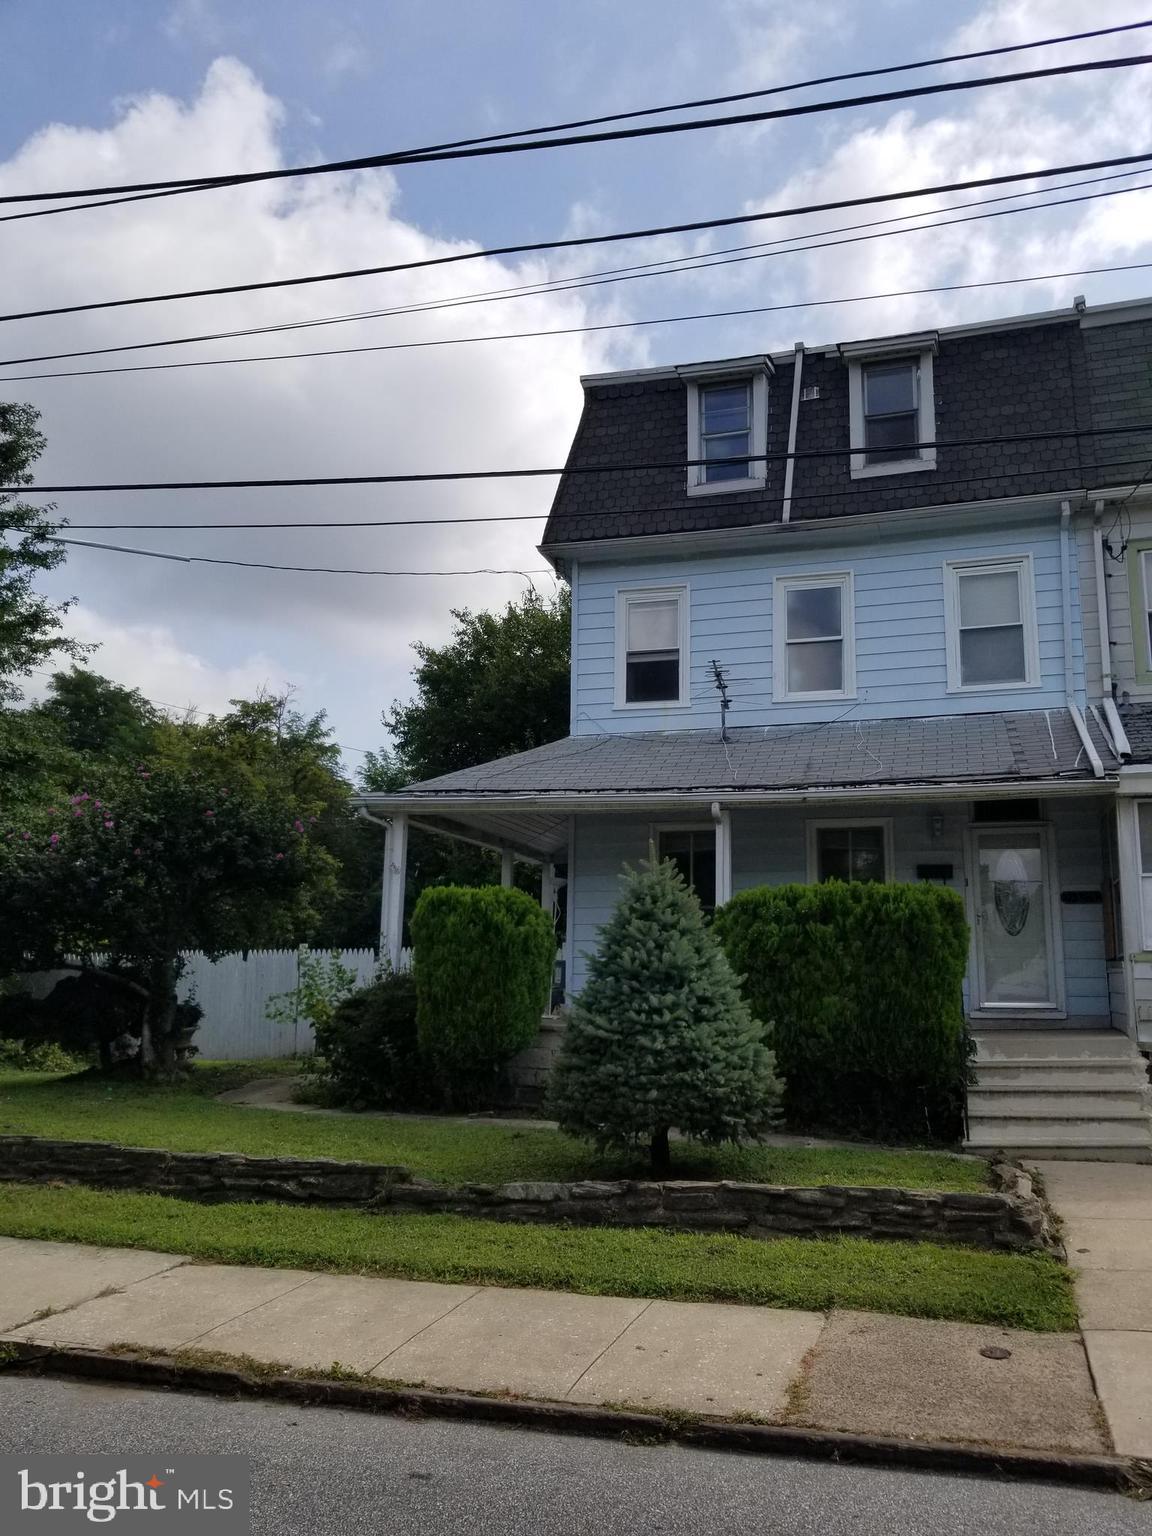 223 PINE STREET, SHARON HILL, PA 19079